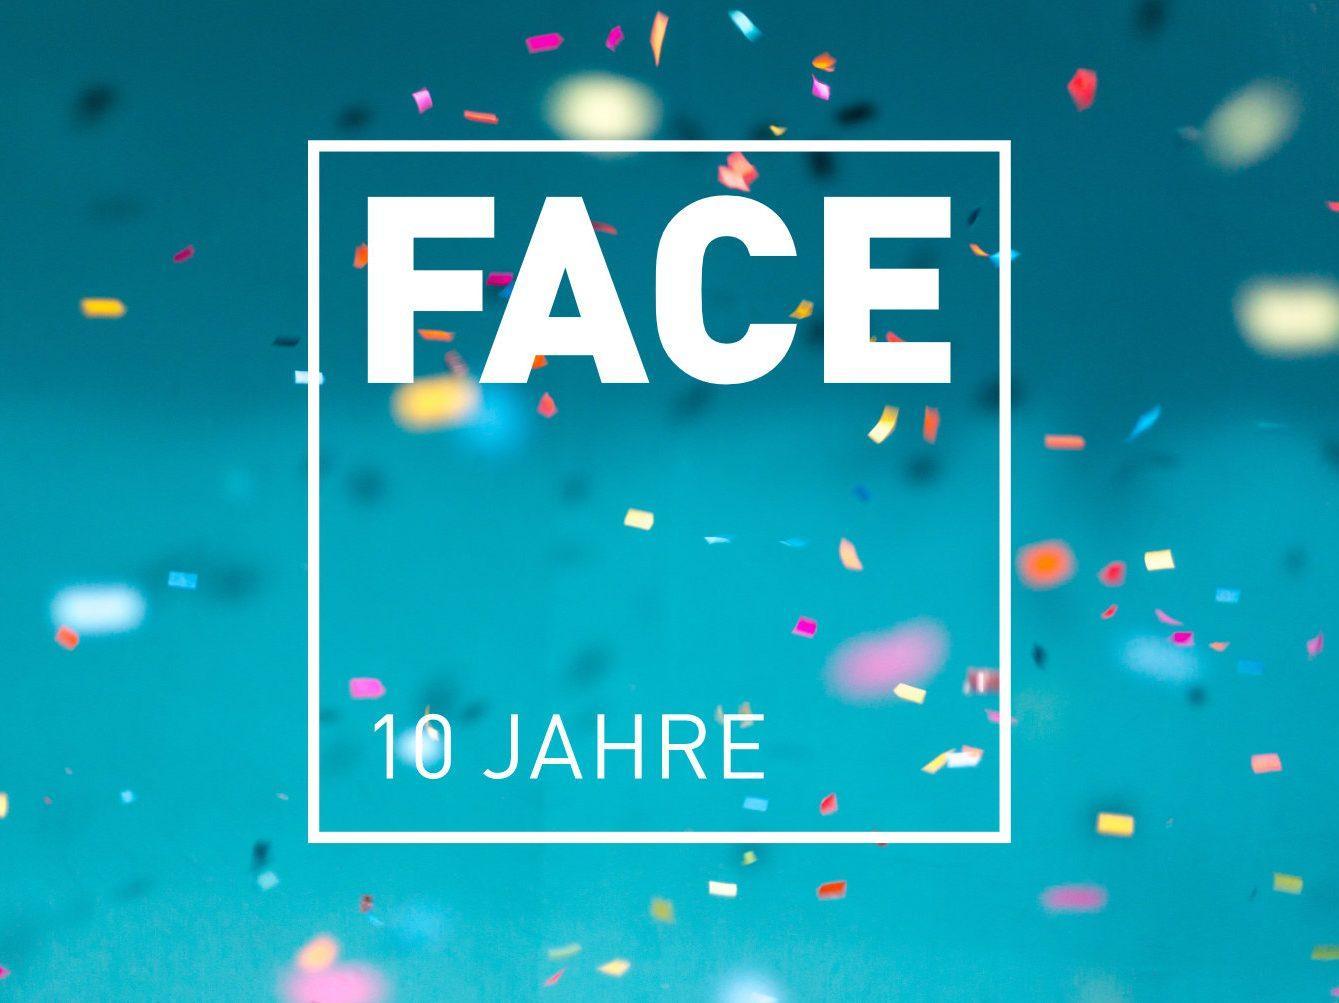 10 JAHRE FACE